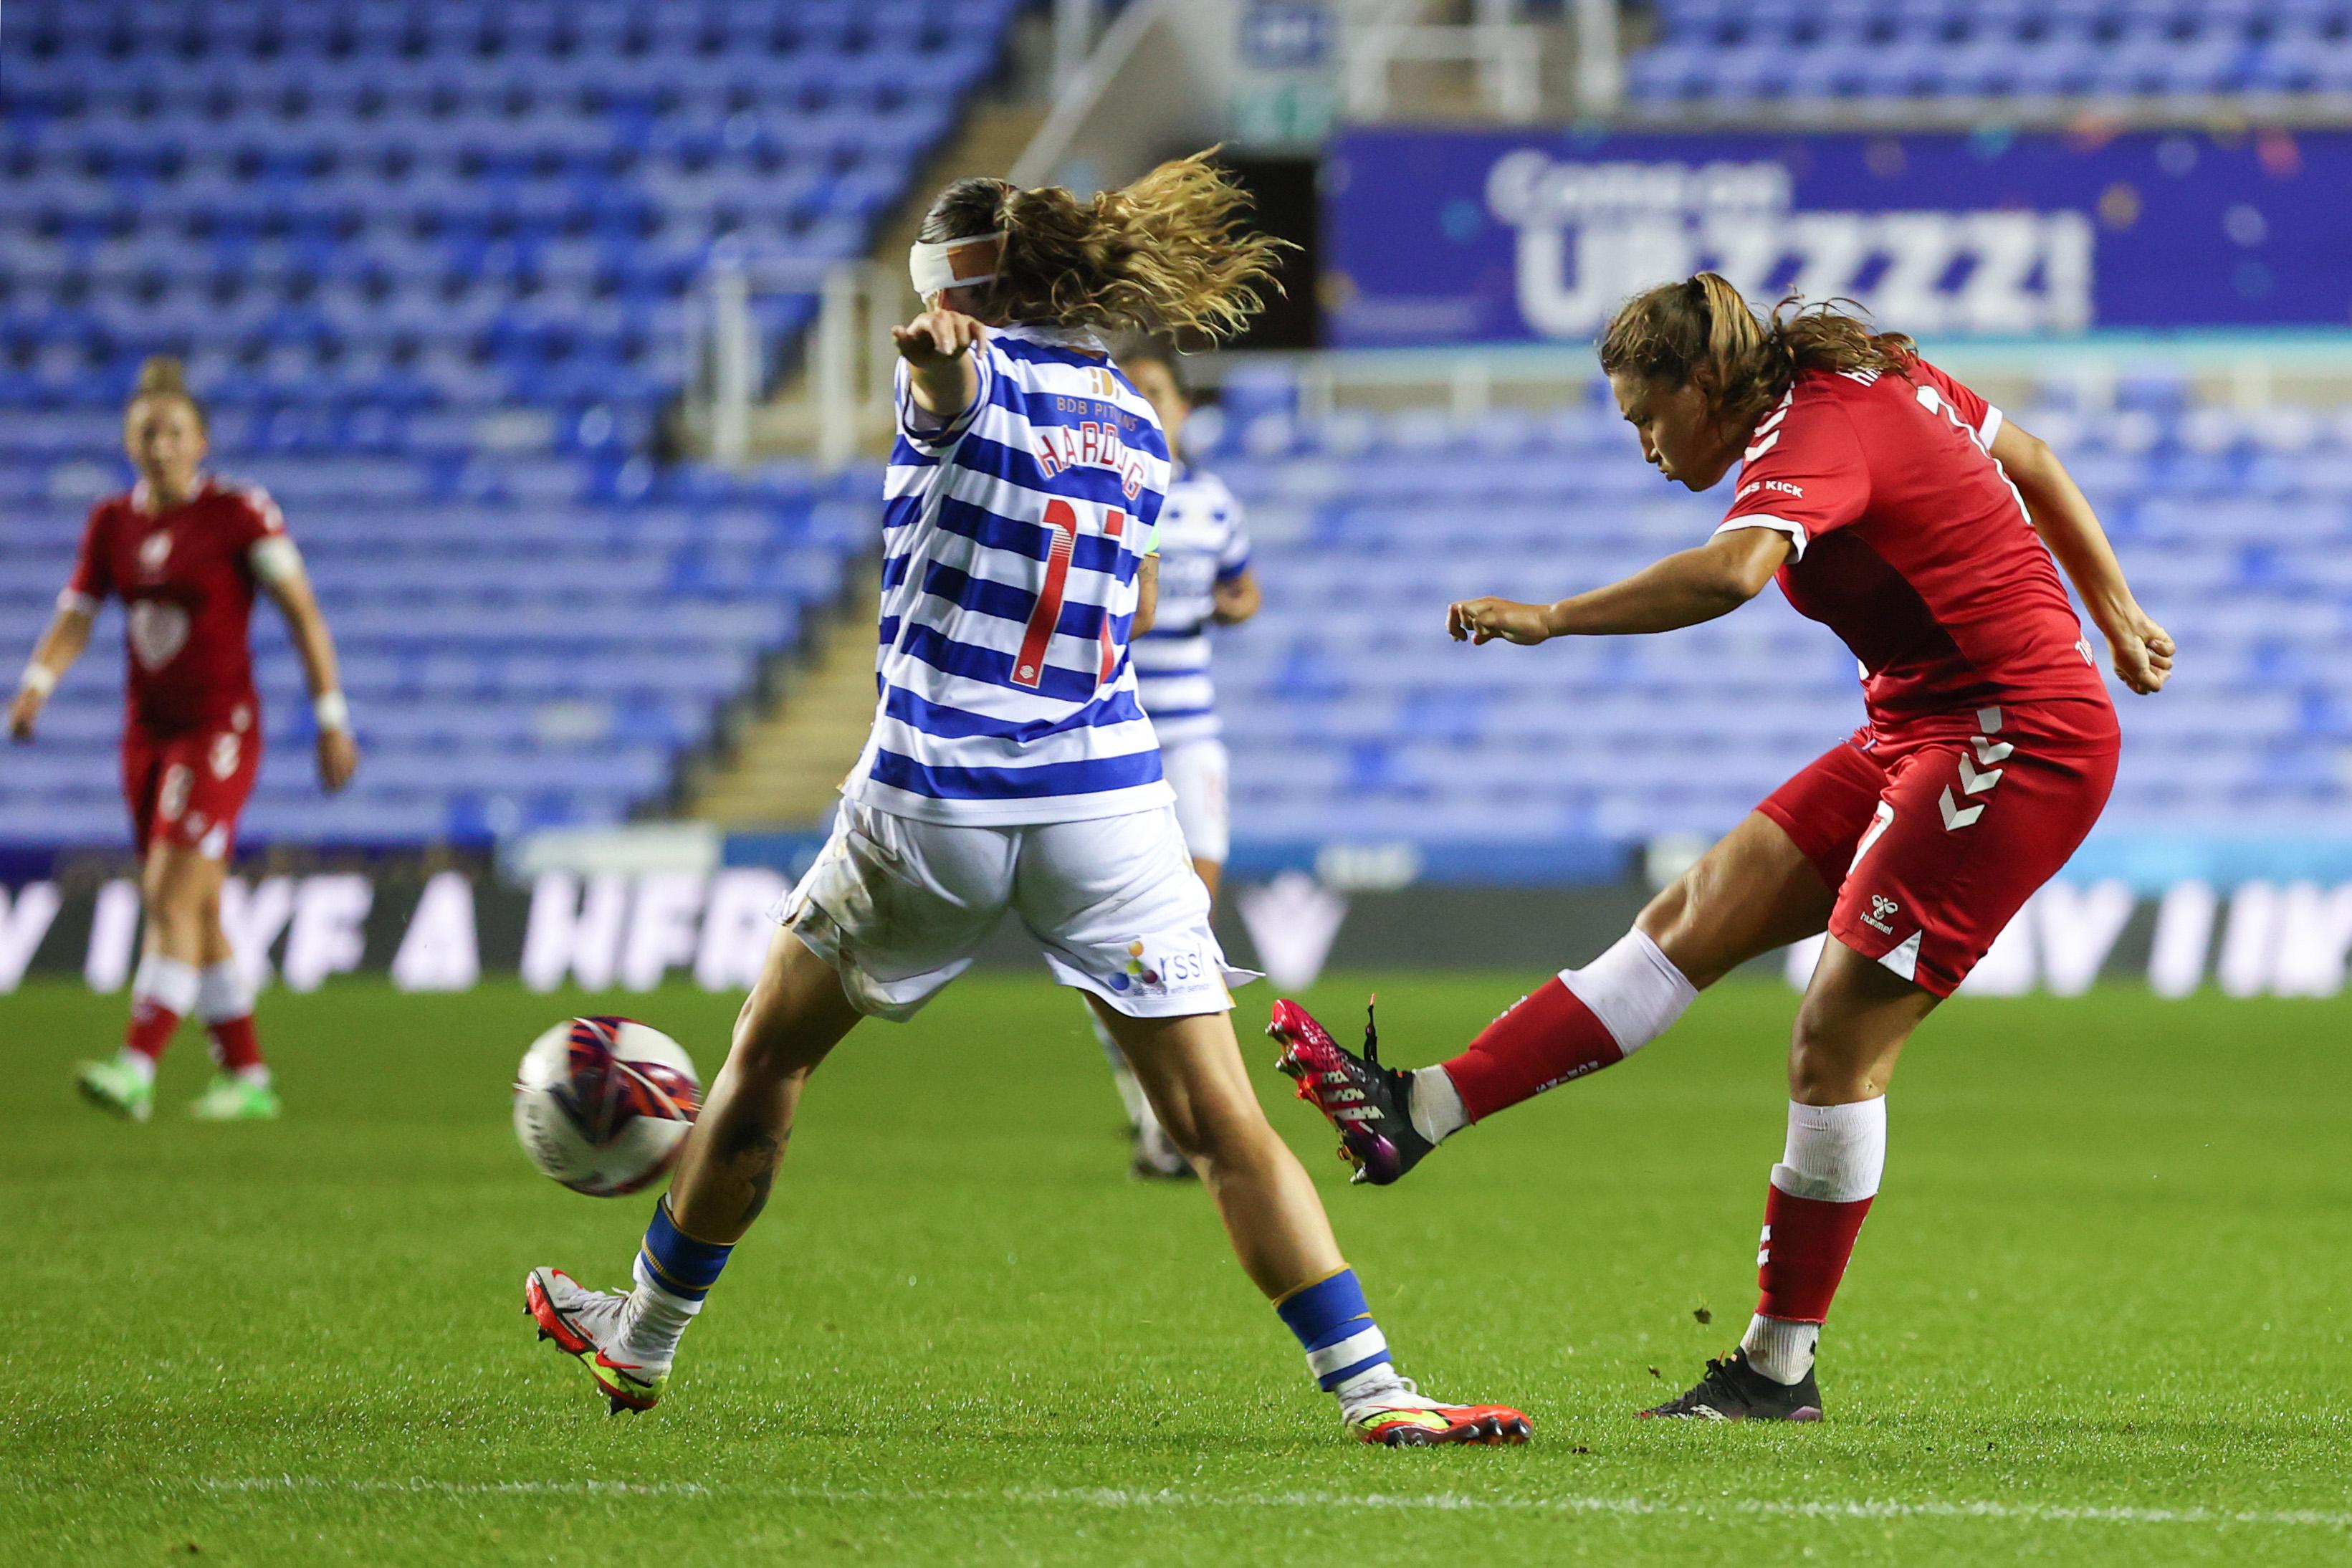 Reading Women v Bristol City Women - FA Women's Continental Tyres League Cup